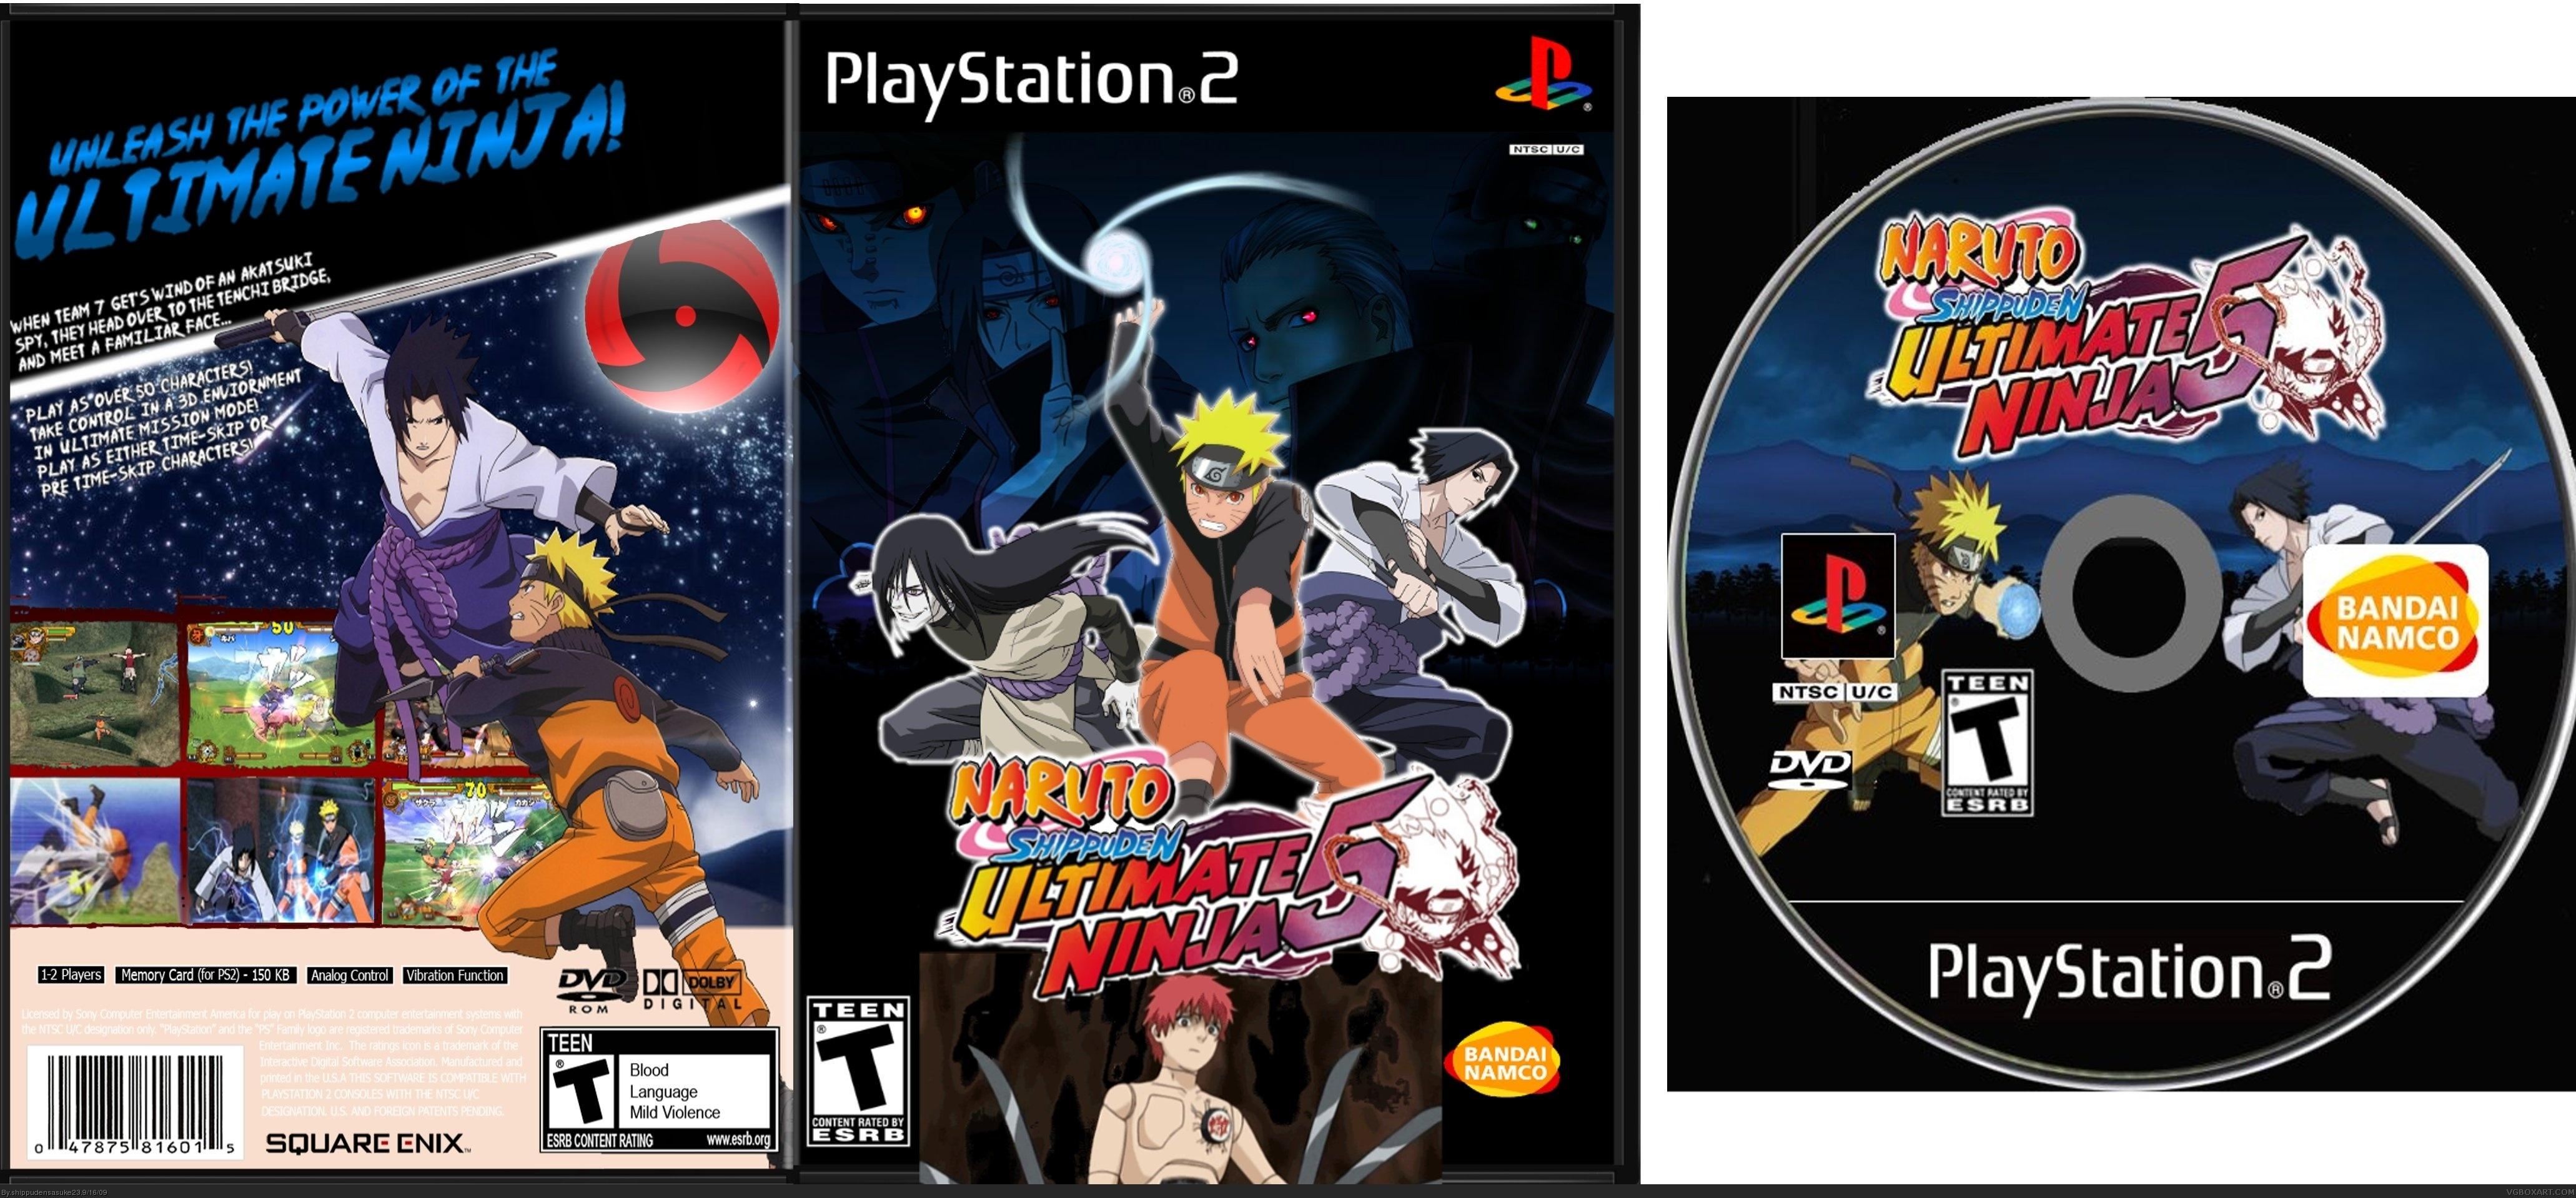 Naruto Shippuden: Ultimate Ninja 5 PlayStation 2 Box Art